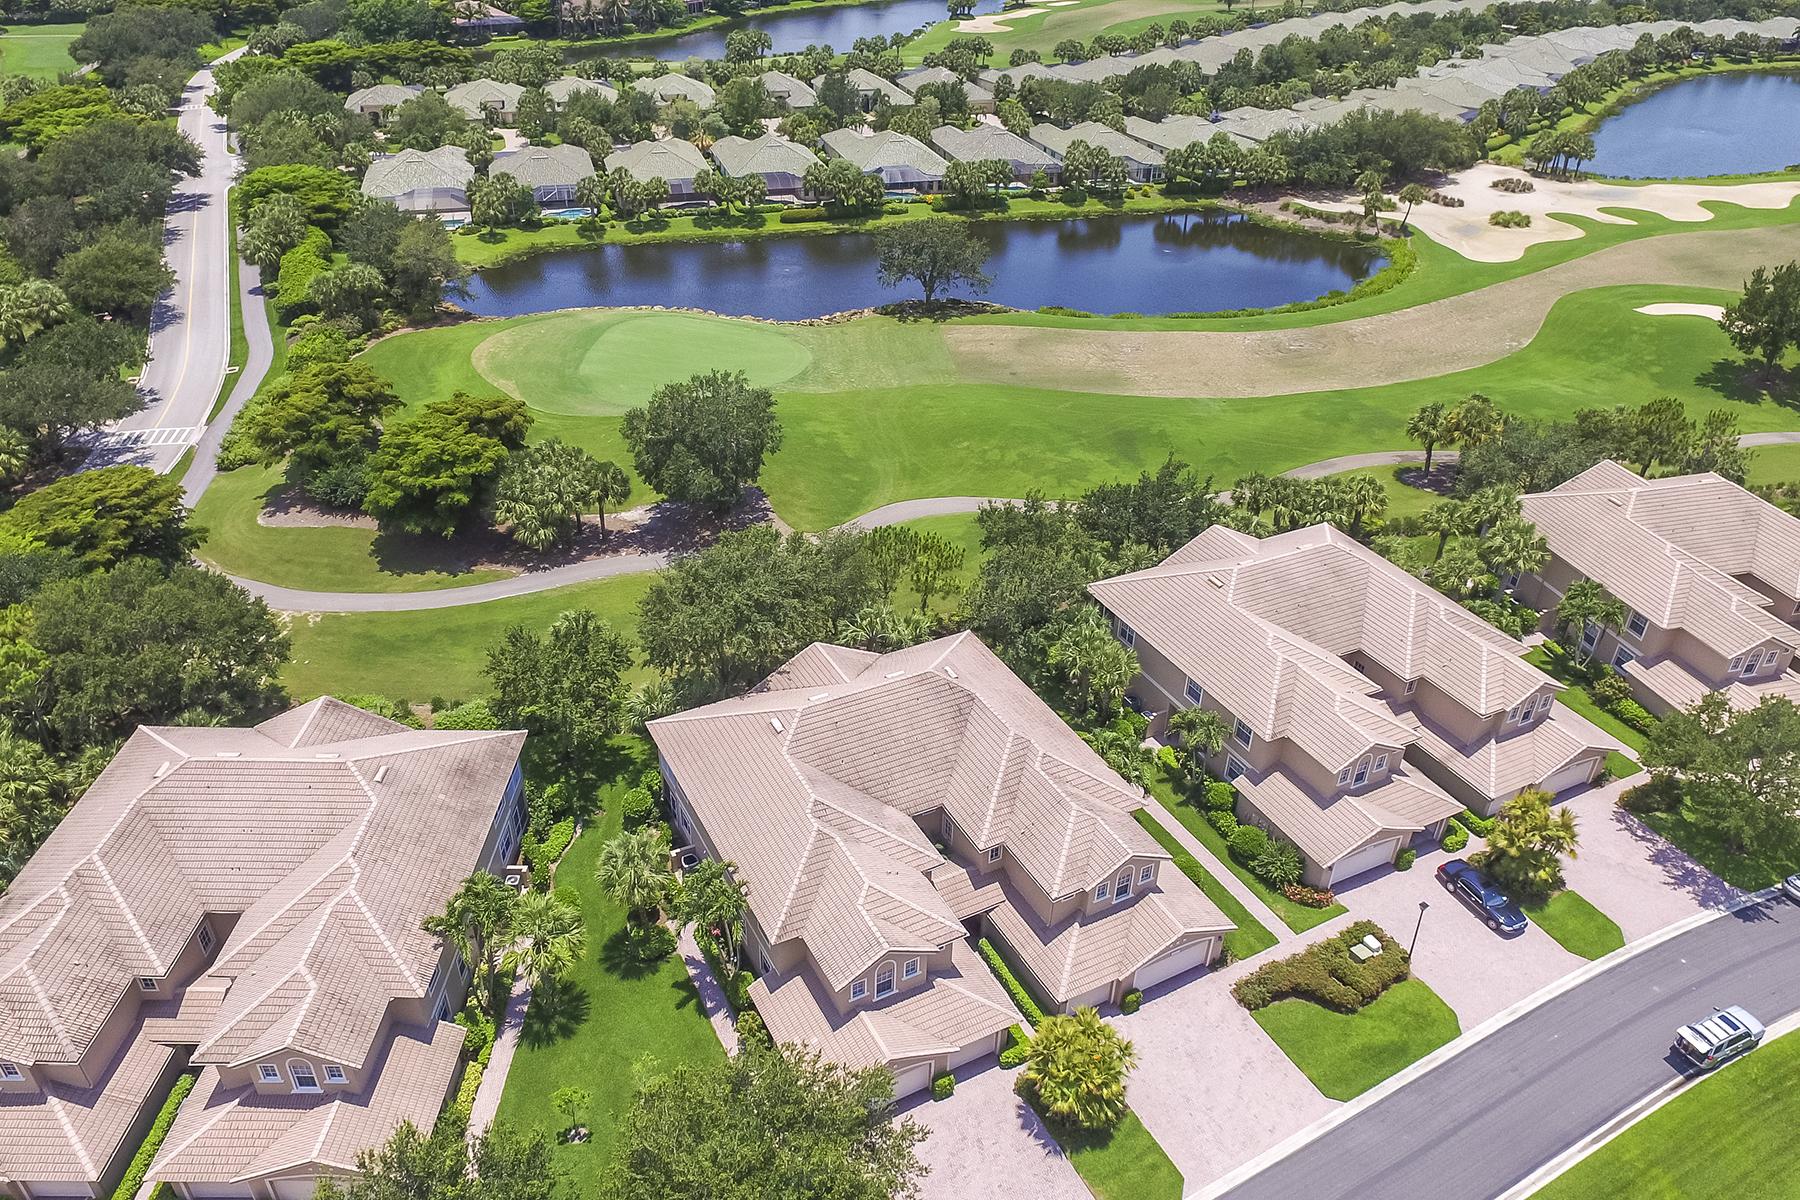 Condomínio para Venda às THE BROOKS - PALMETT RIDGE AT SHADOW WOOD - THE B 9261 Palmetto Ridge Dr 202 Estero, Florida, 34135 Estados Unidos